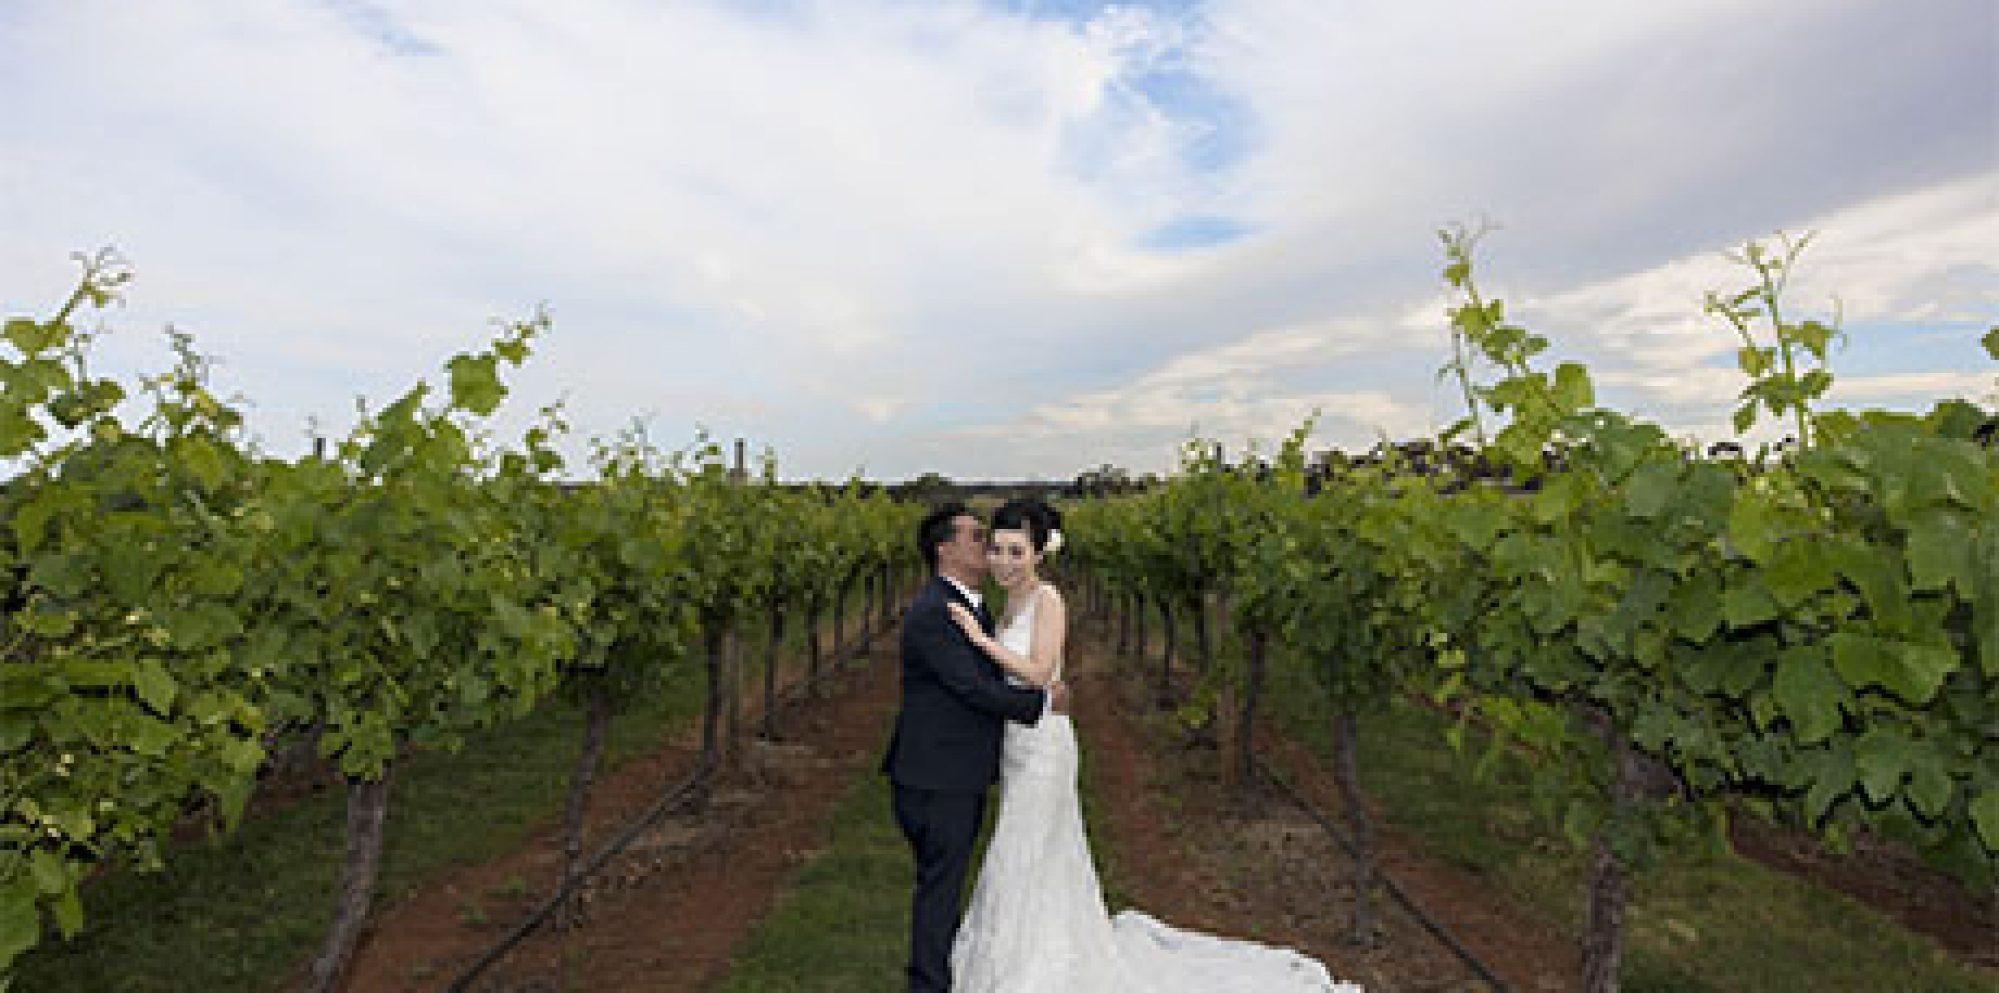 Mariko & jr witchmount function centre wedding photographer melbourne